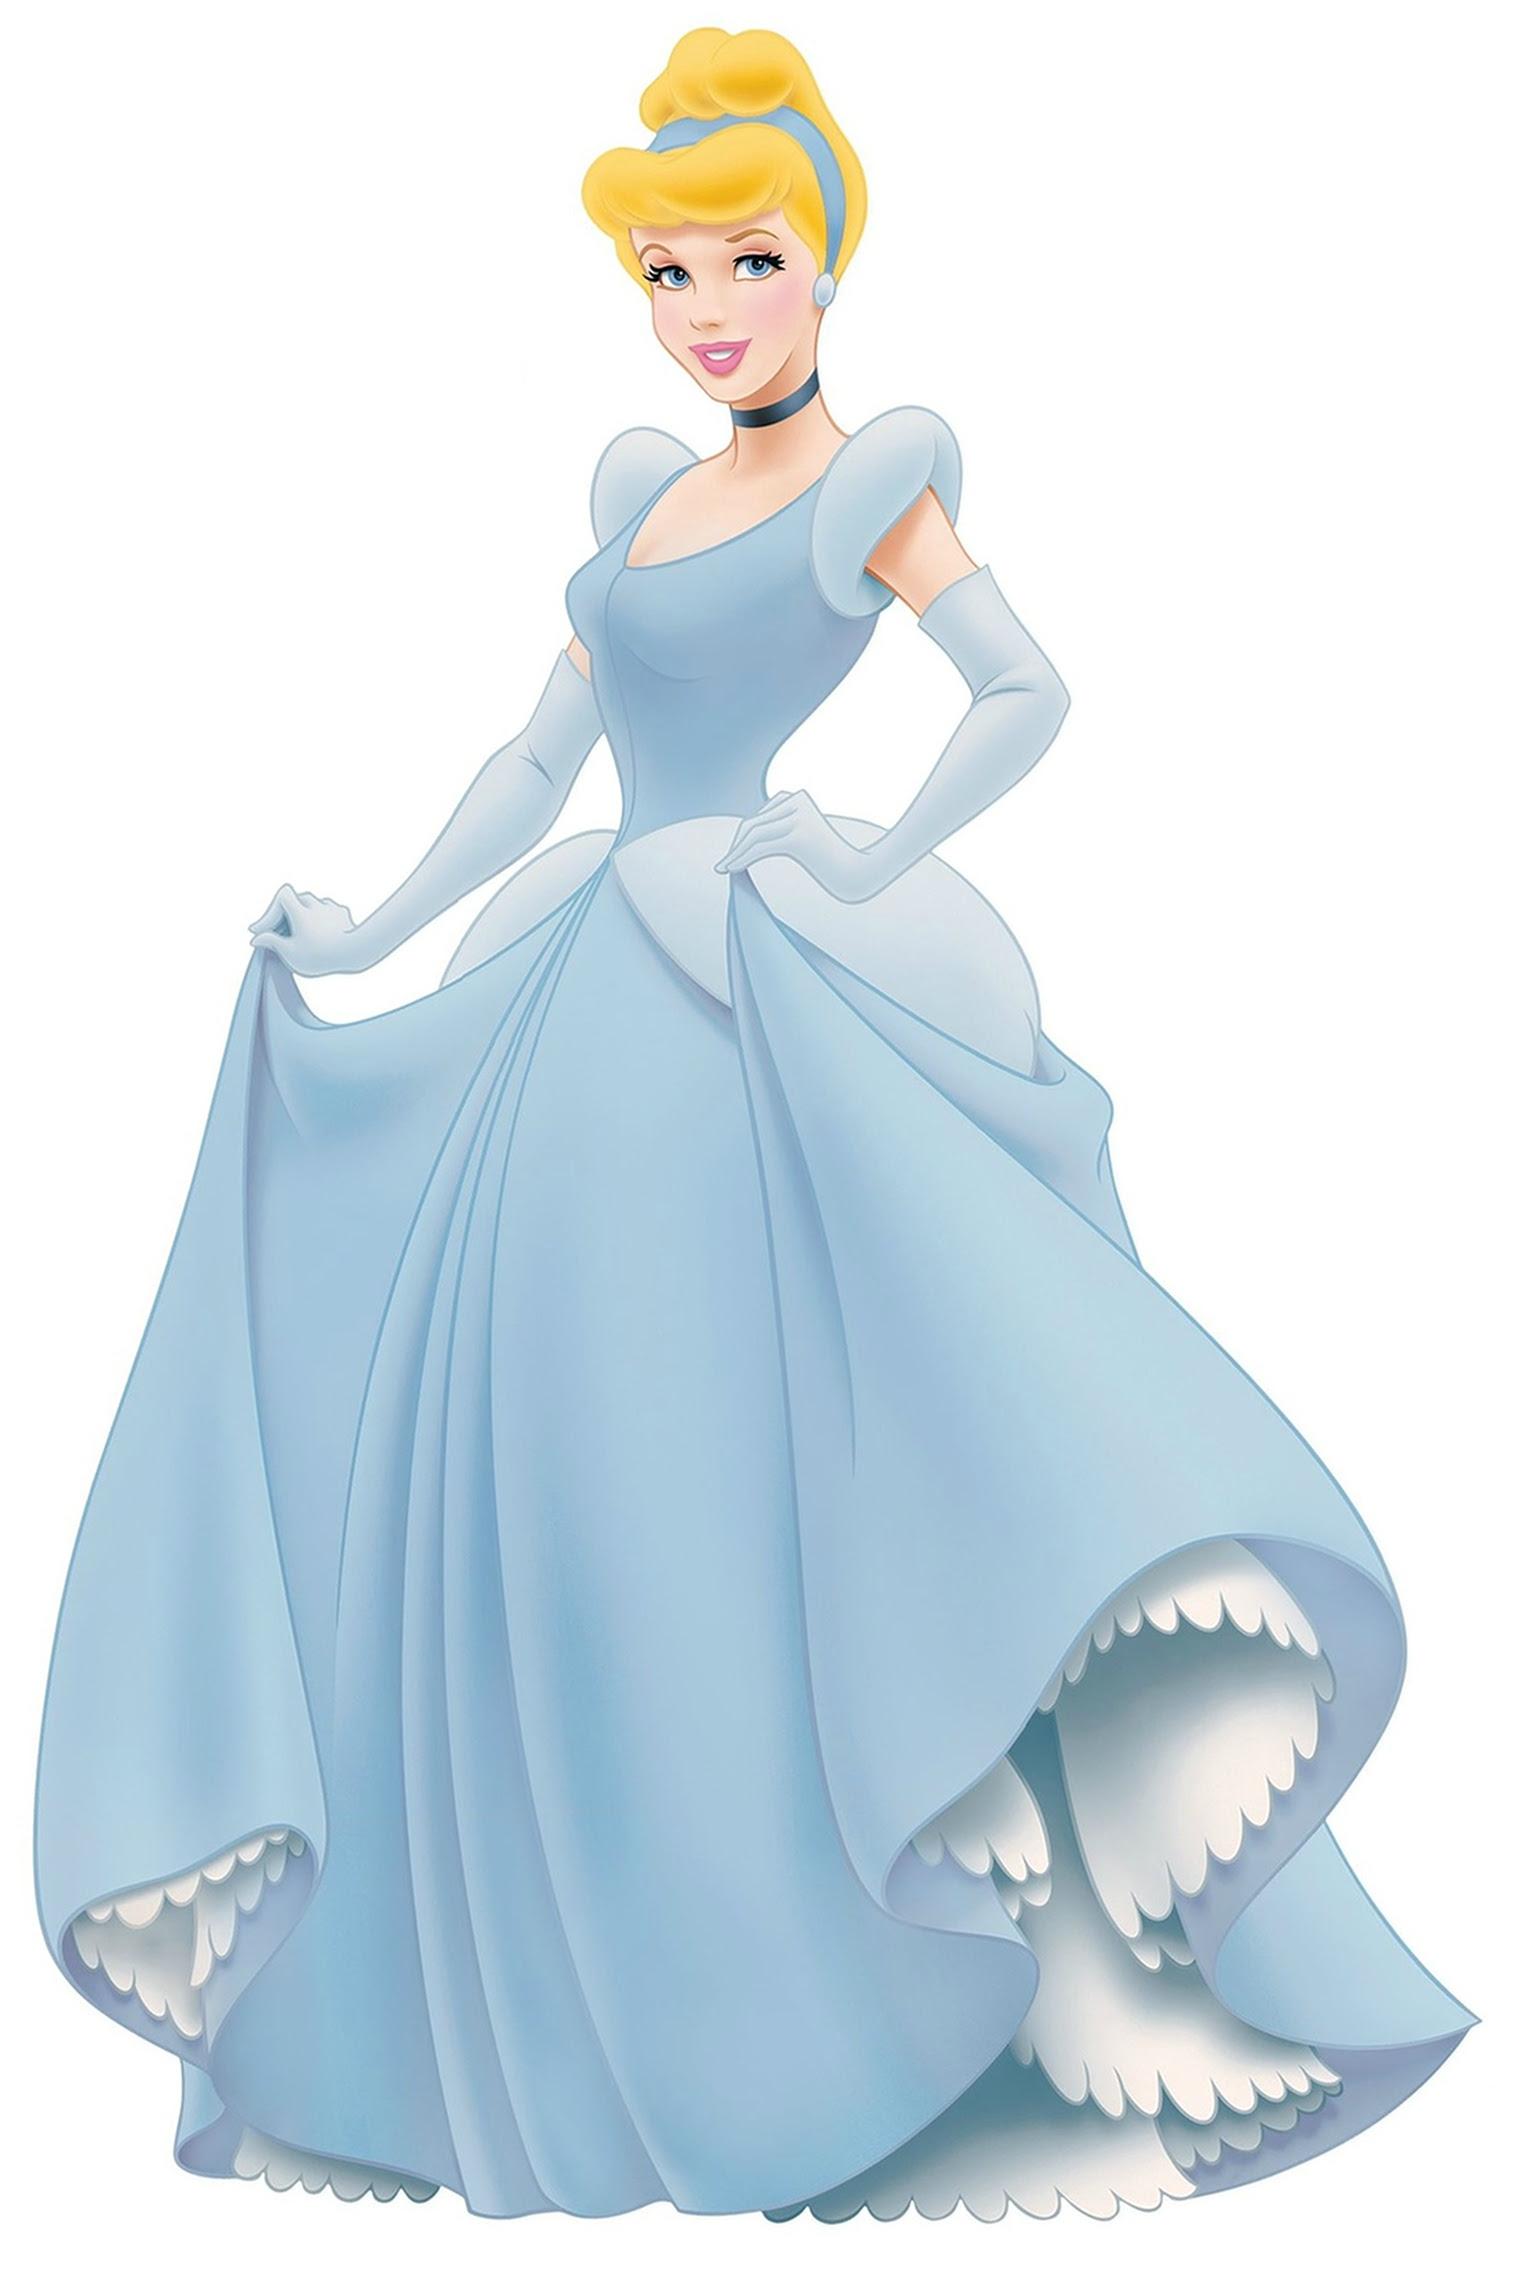 List of Disney Princess Songs | Disney Princess Wiki ...